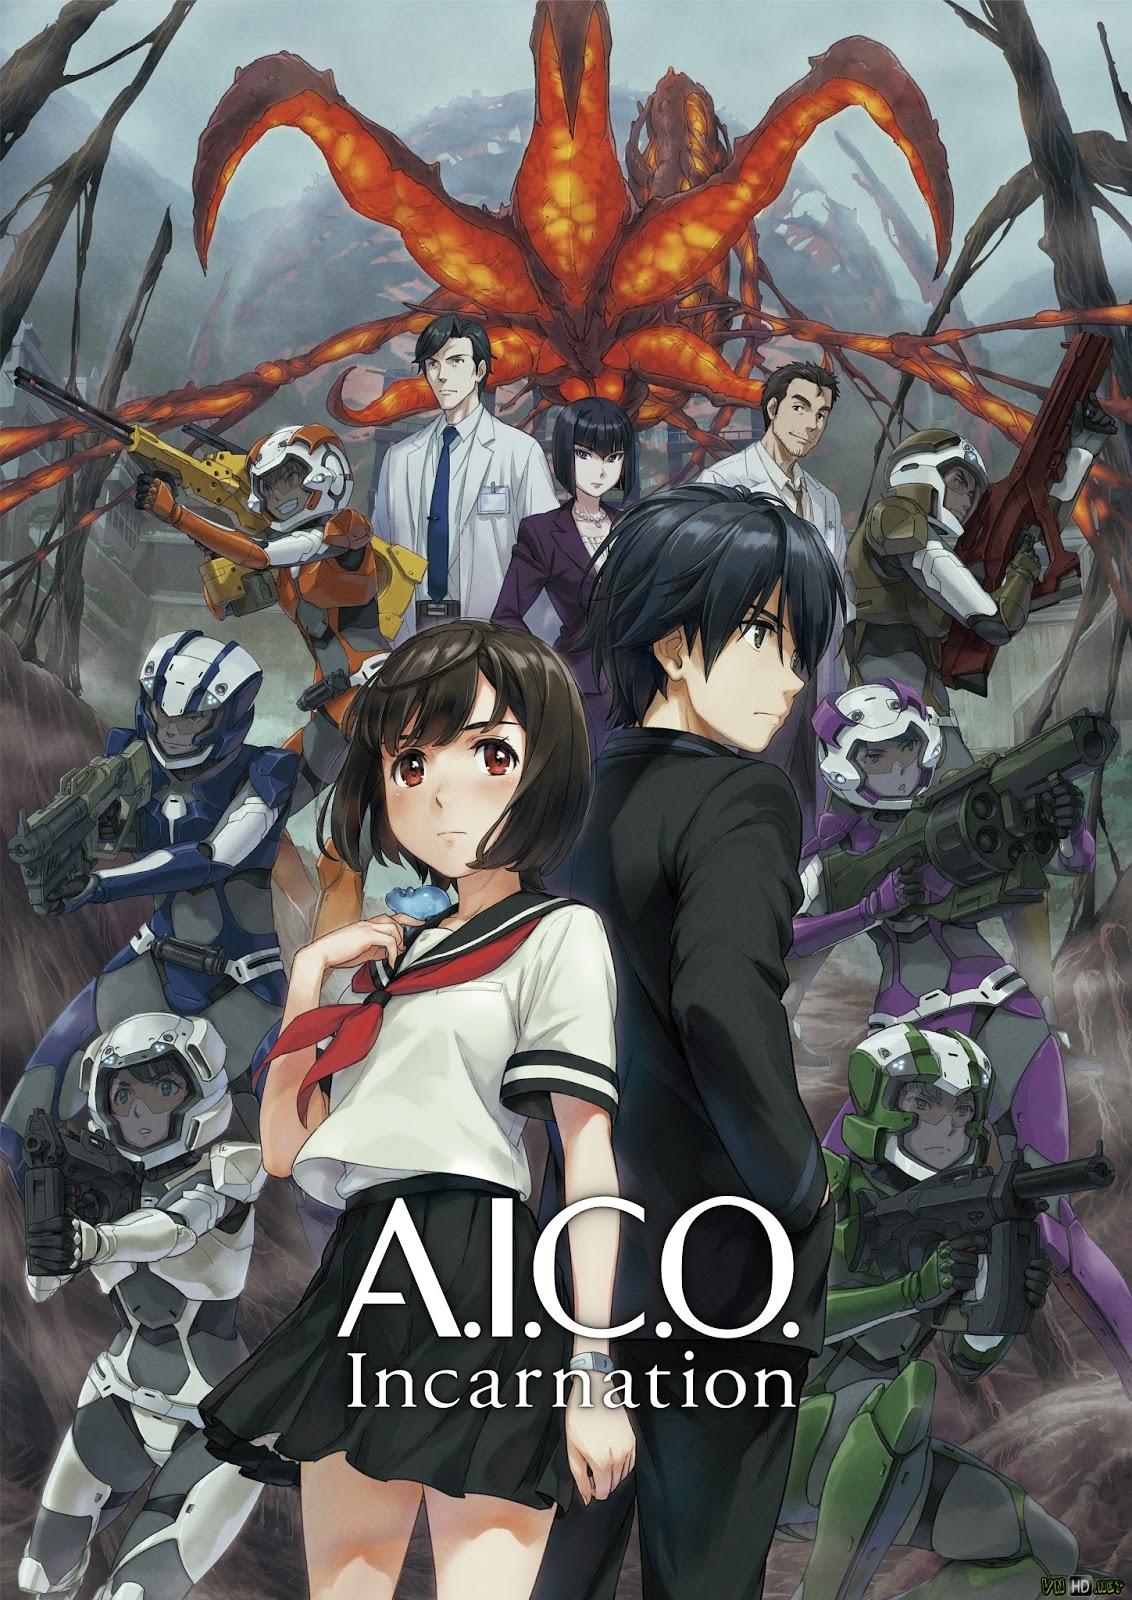 A.I.C.O. -Incarnation